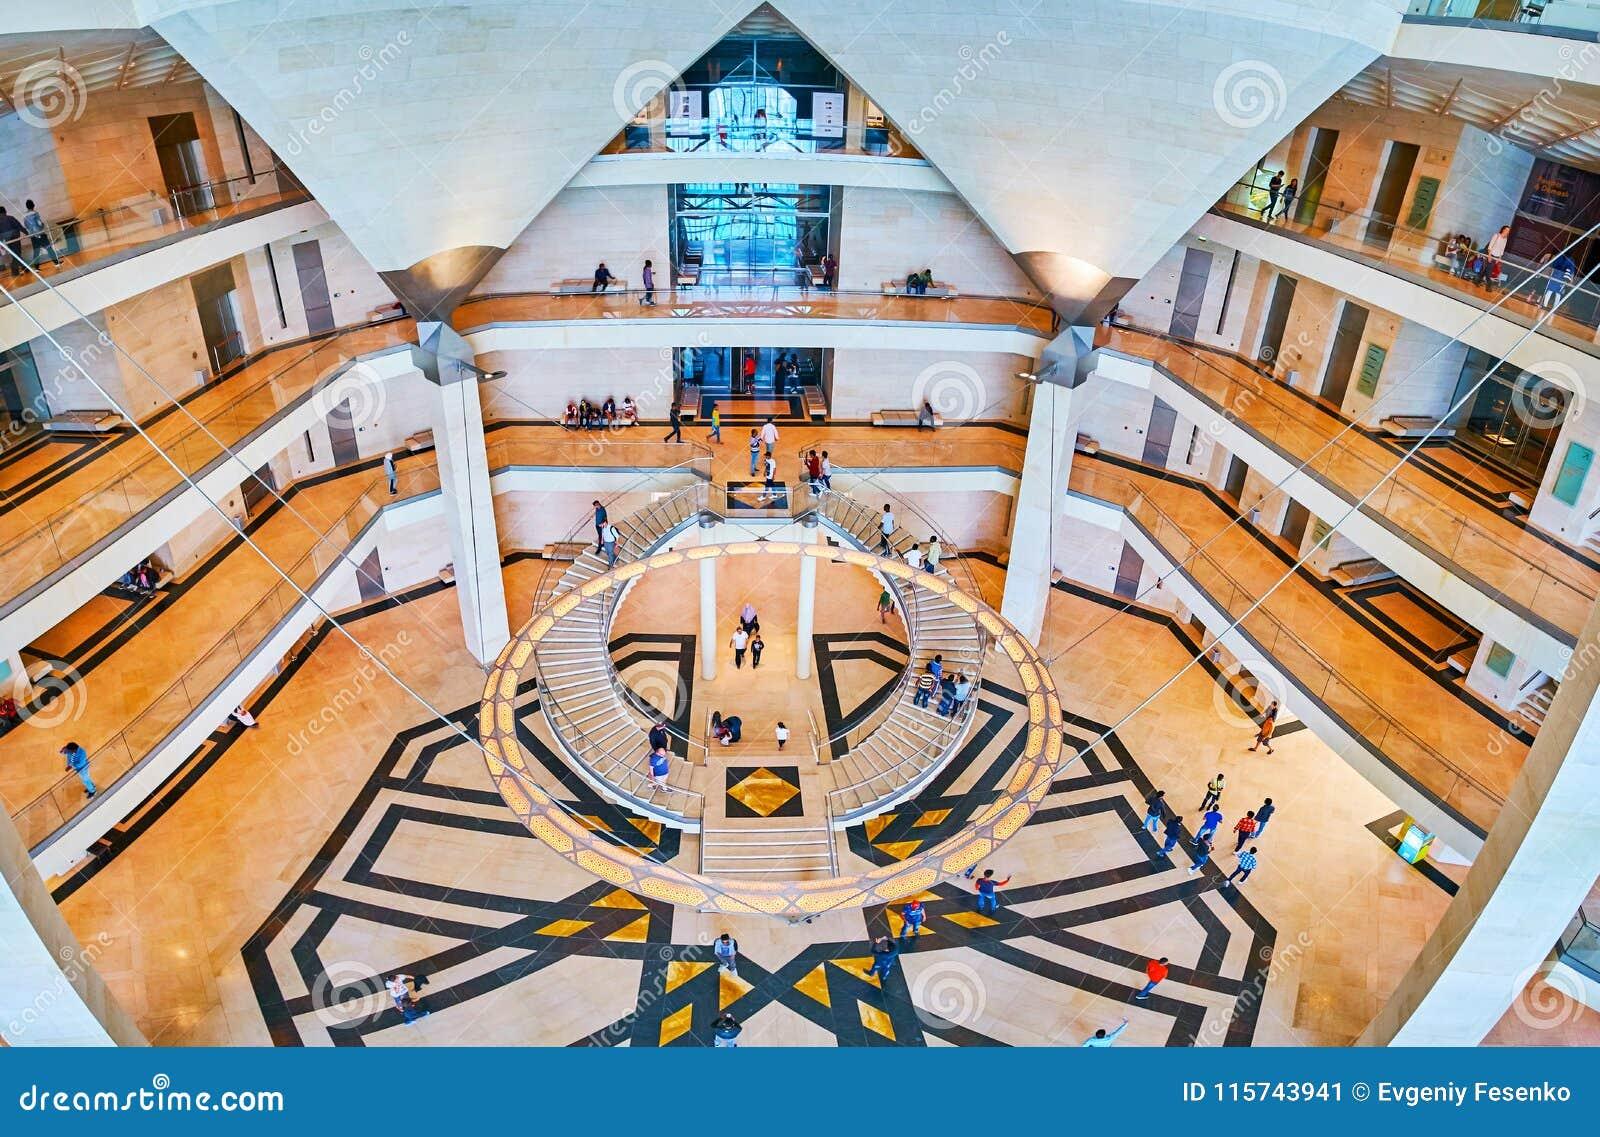 Panorama Of Islamic Art Museums Interior Doha Qatar